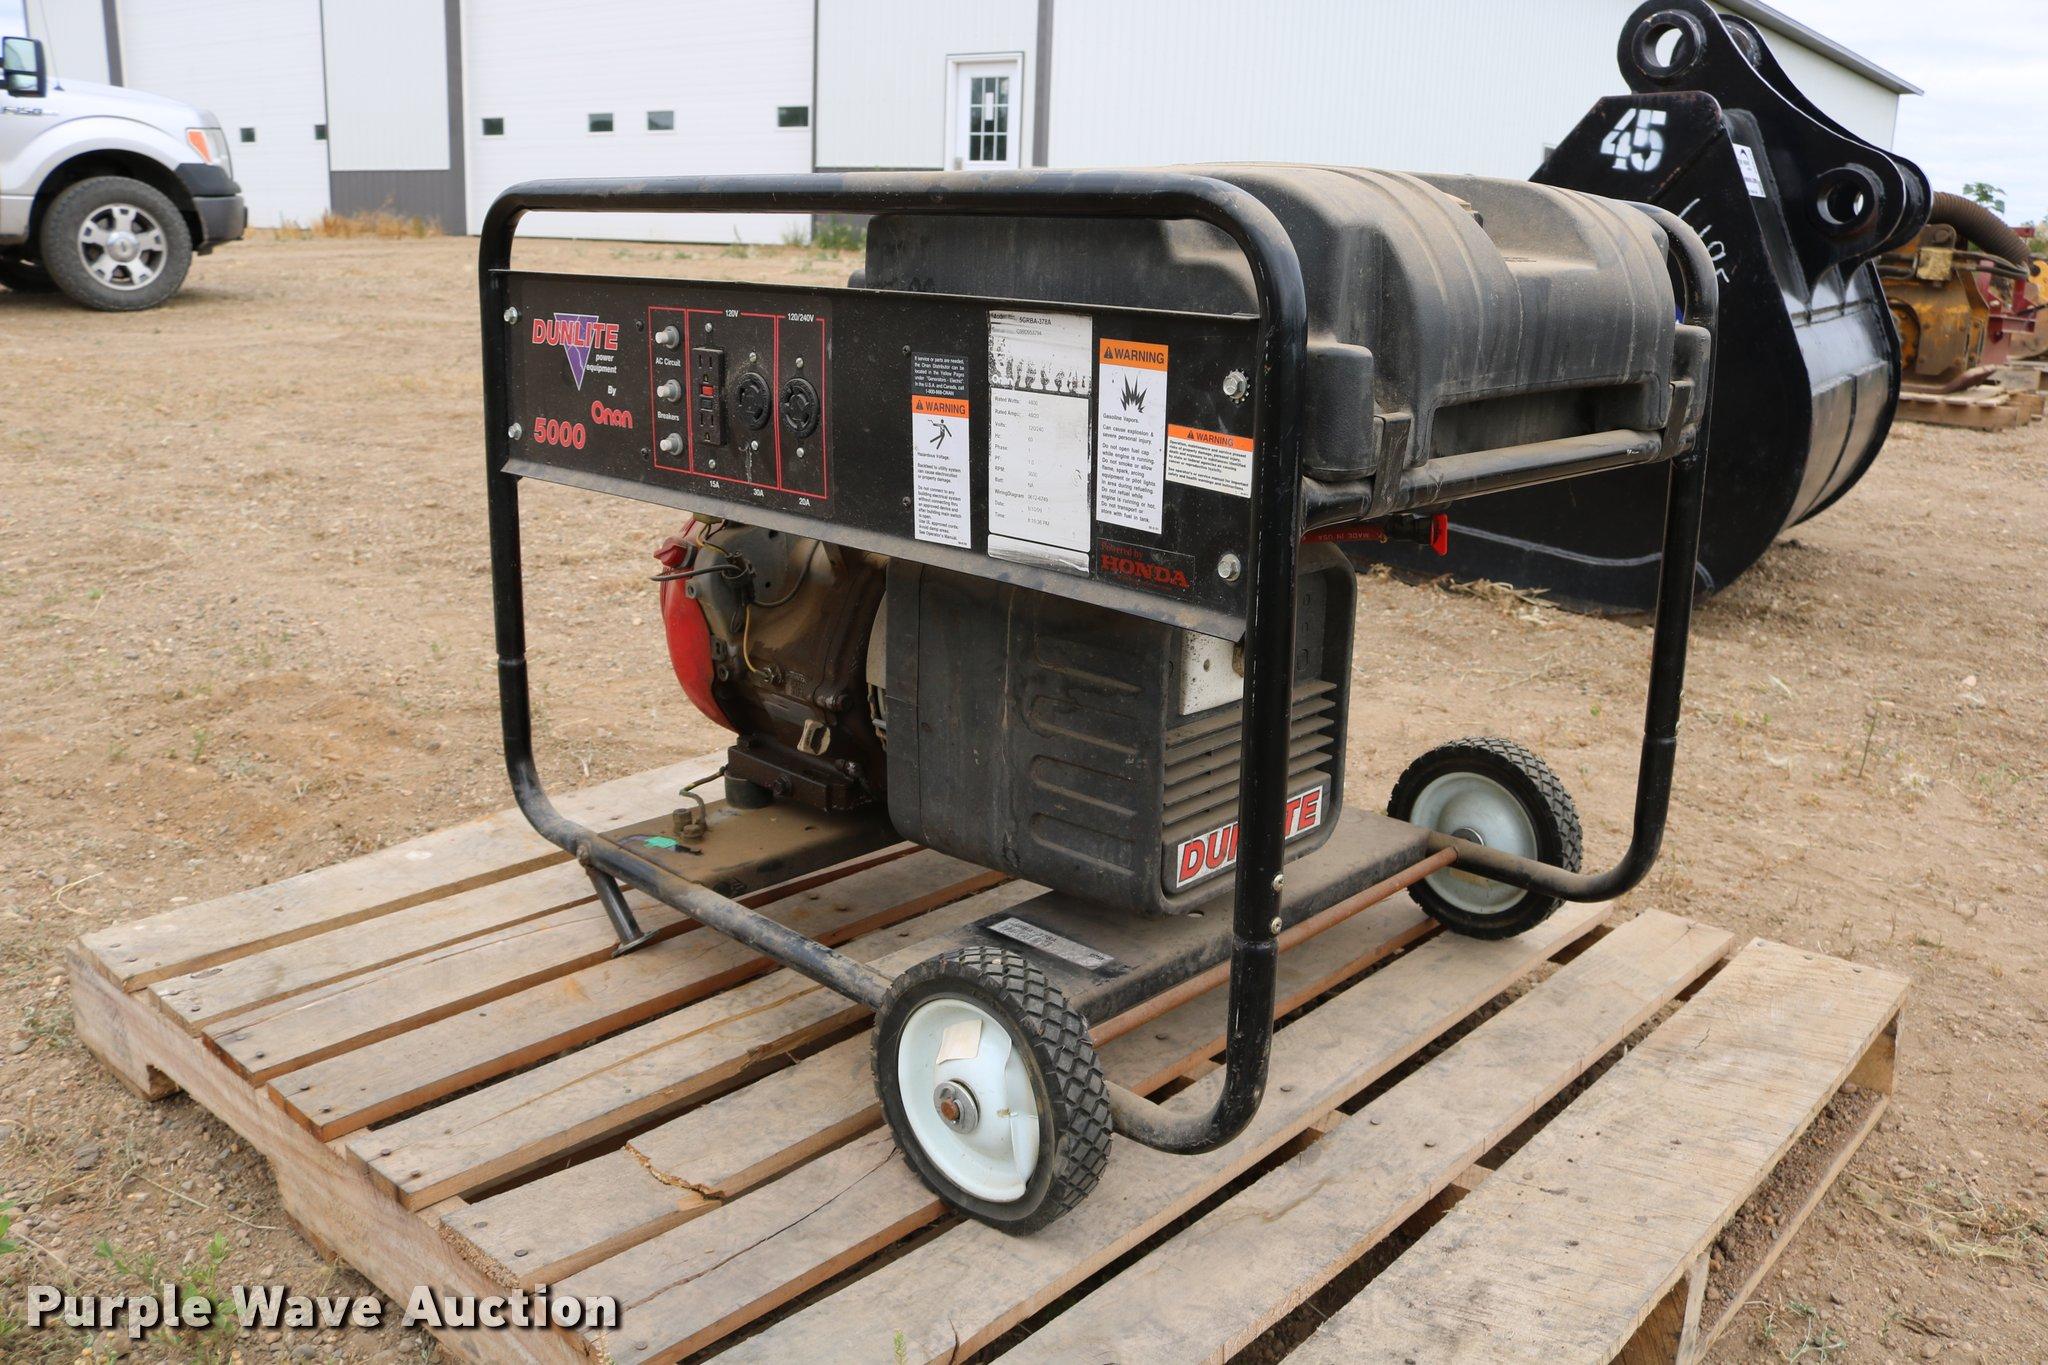 Onan dunlite power equipment 5grba 378a generator item dm9 full size in new window cheapraybanclubmaster Choice Image